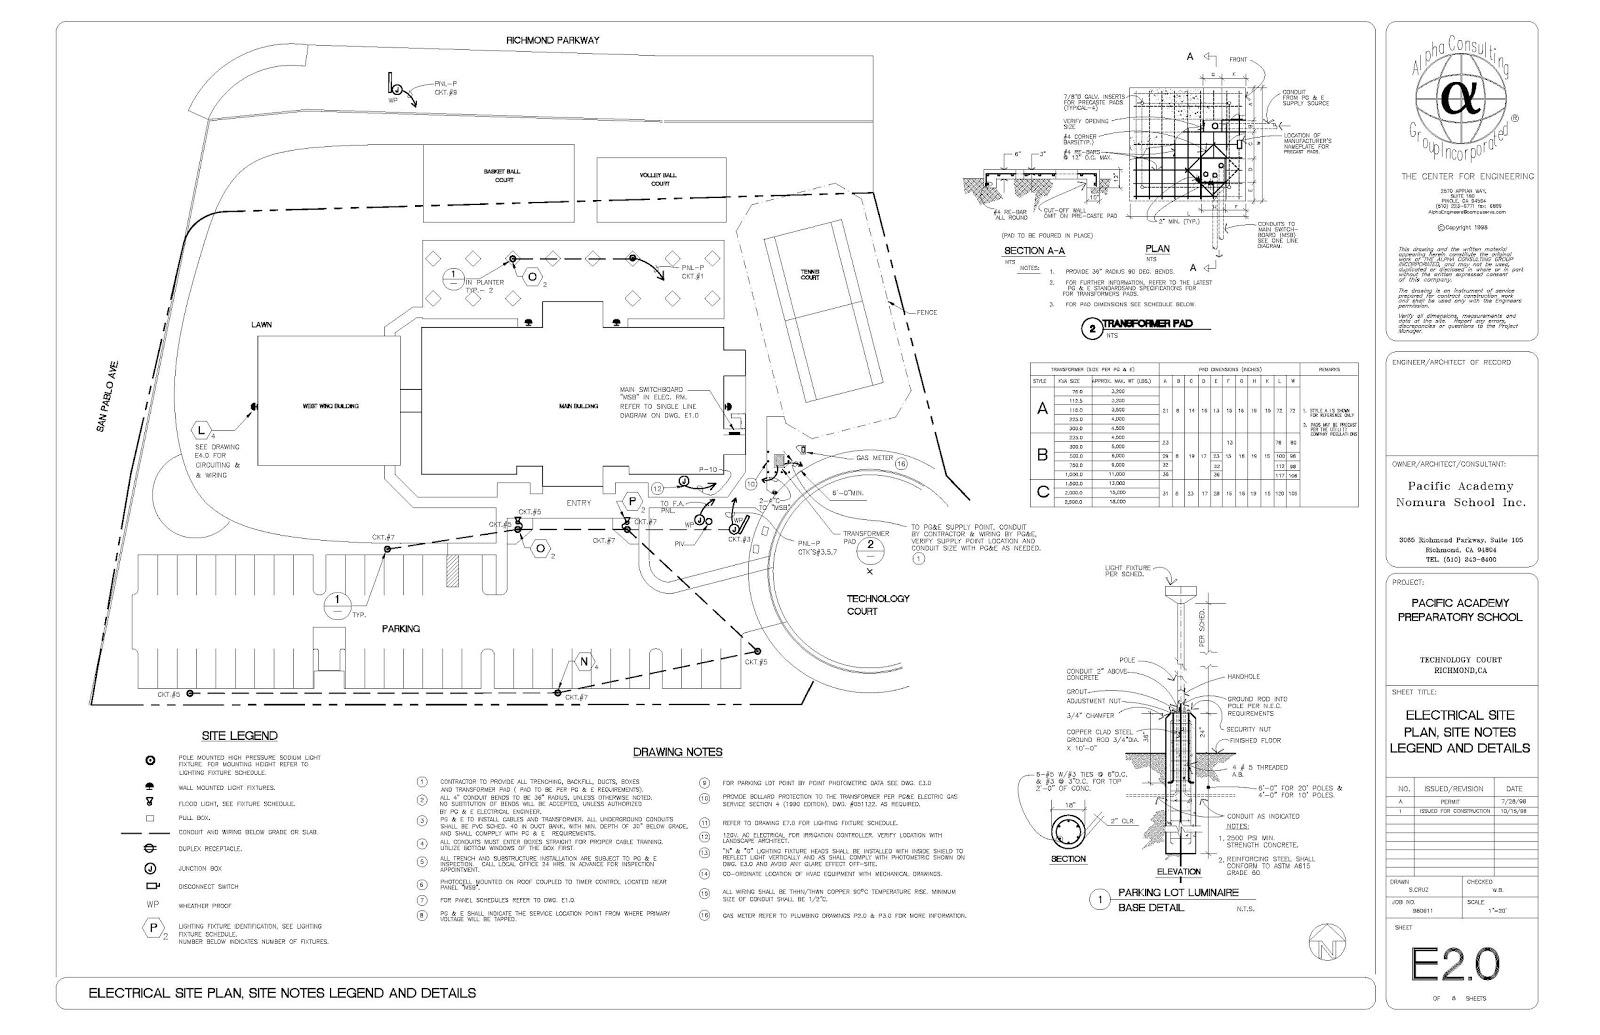 how to read rebar blueprints